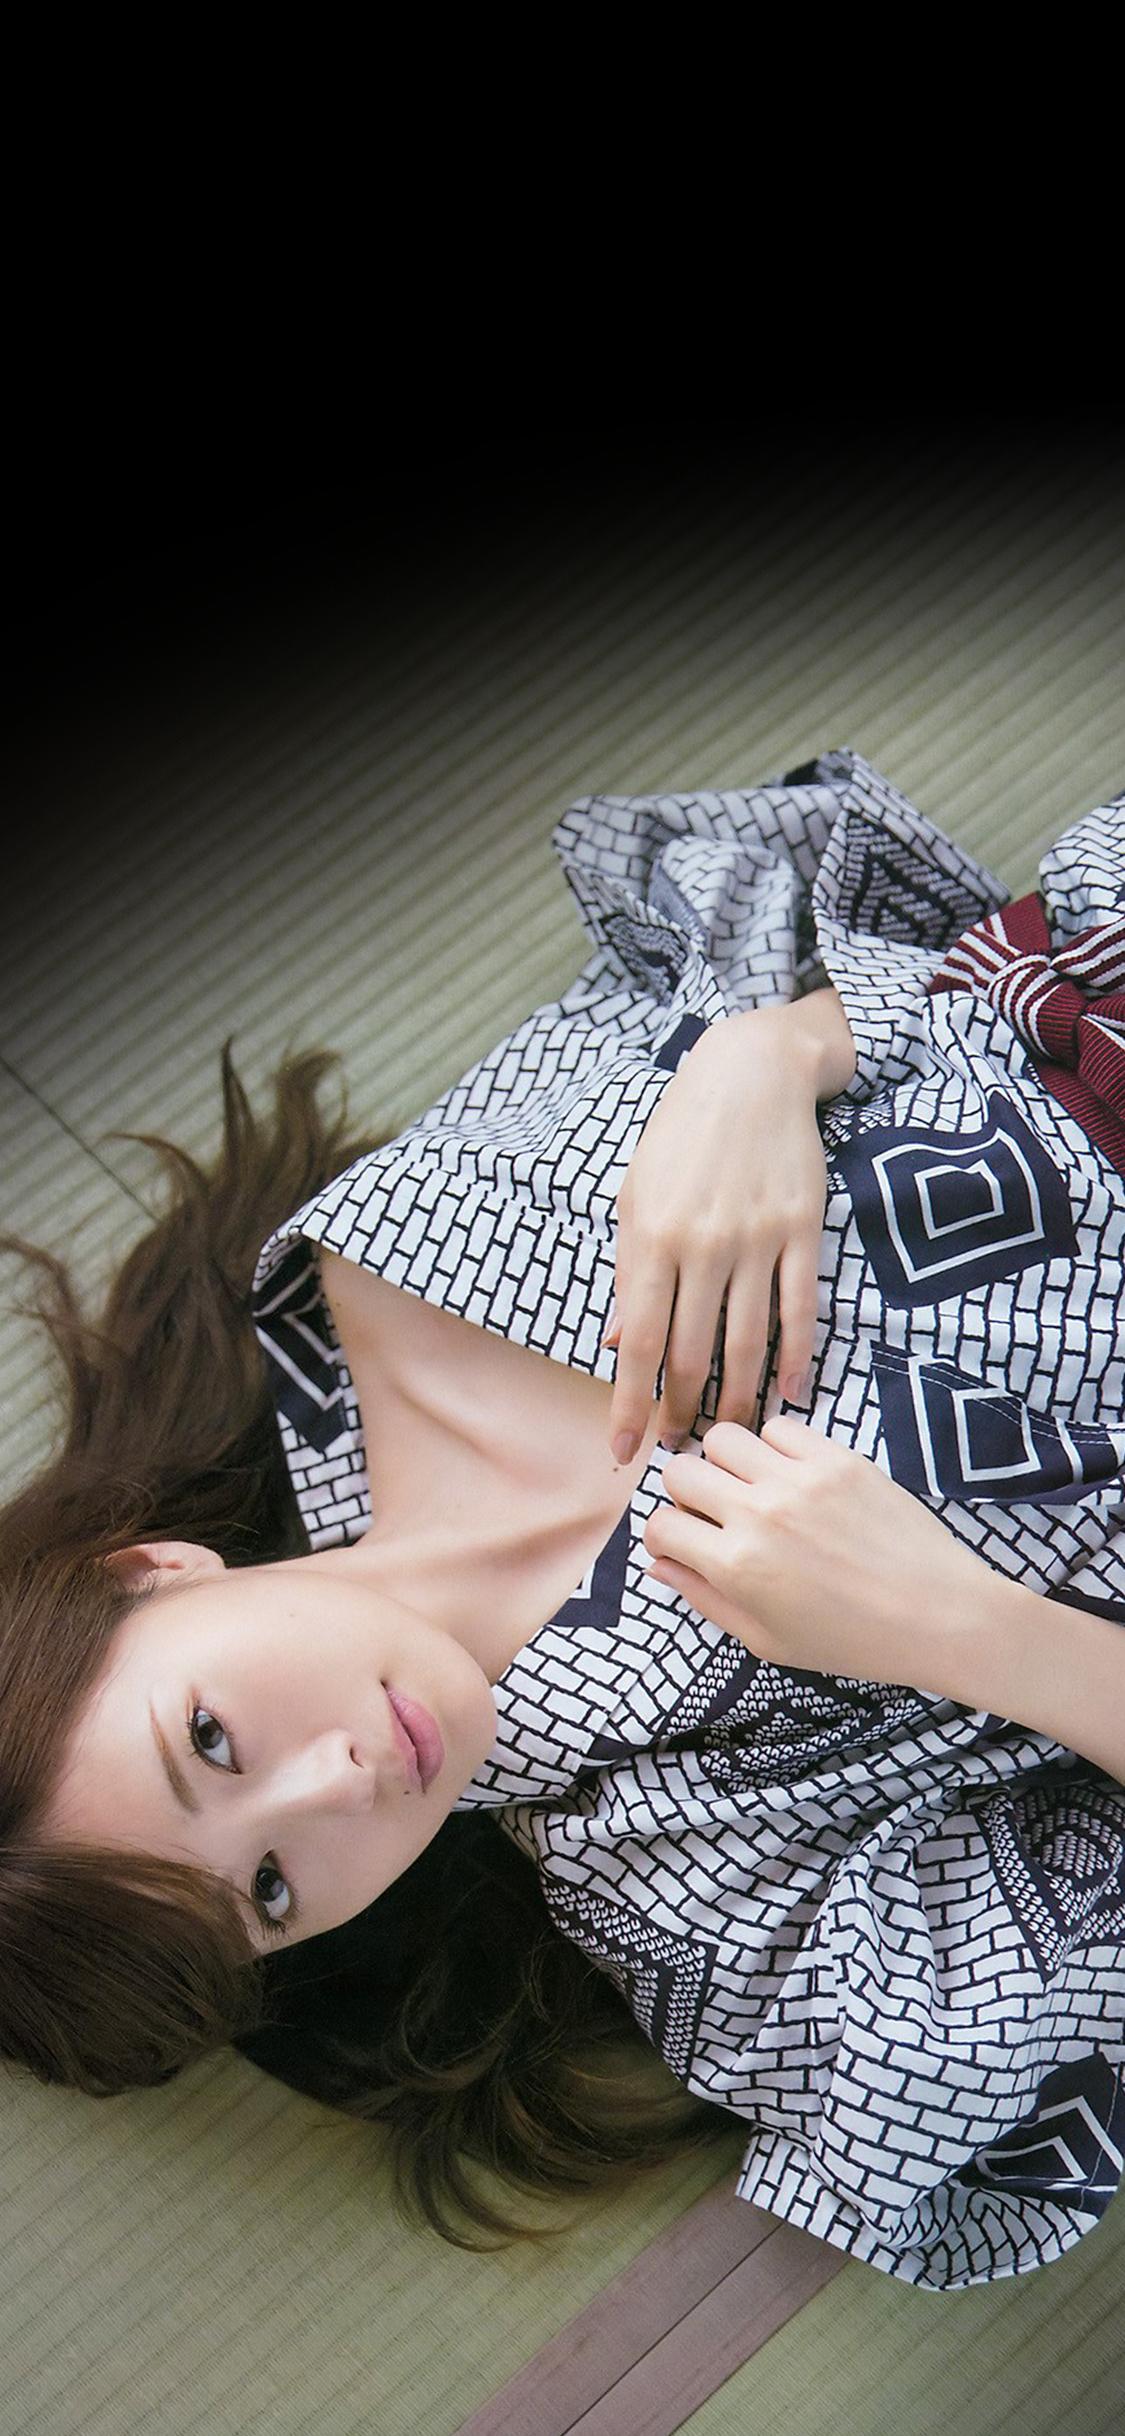 iphone_2436x1125_siraisimai_16